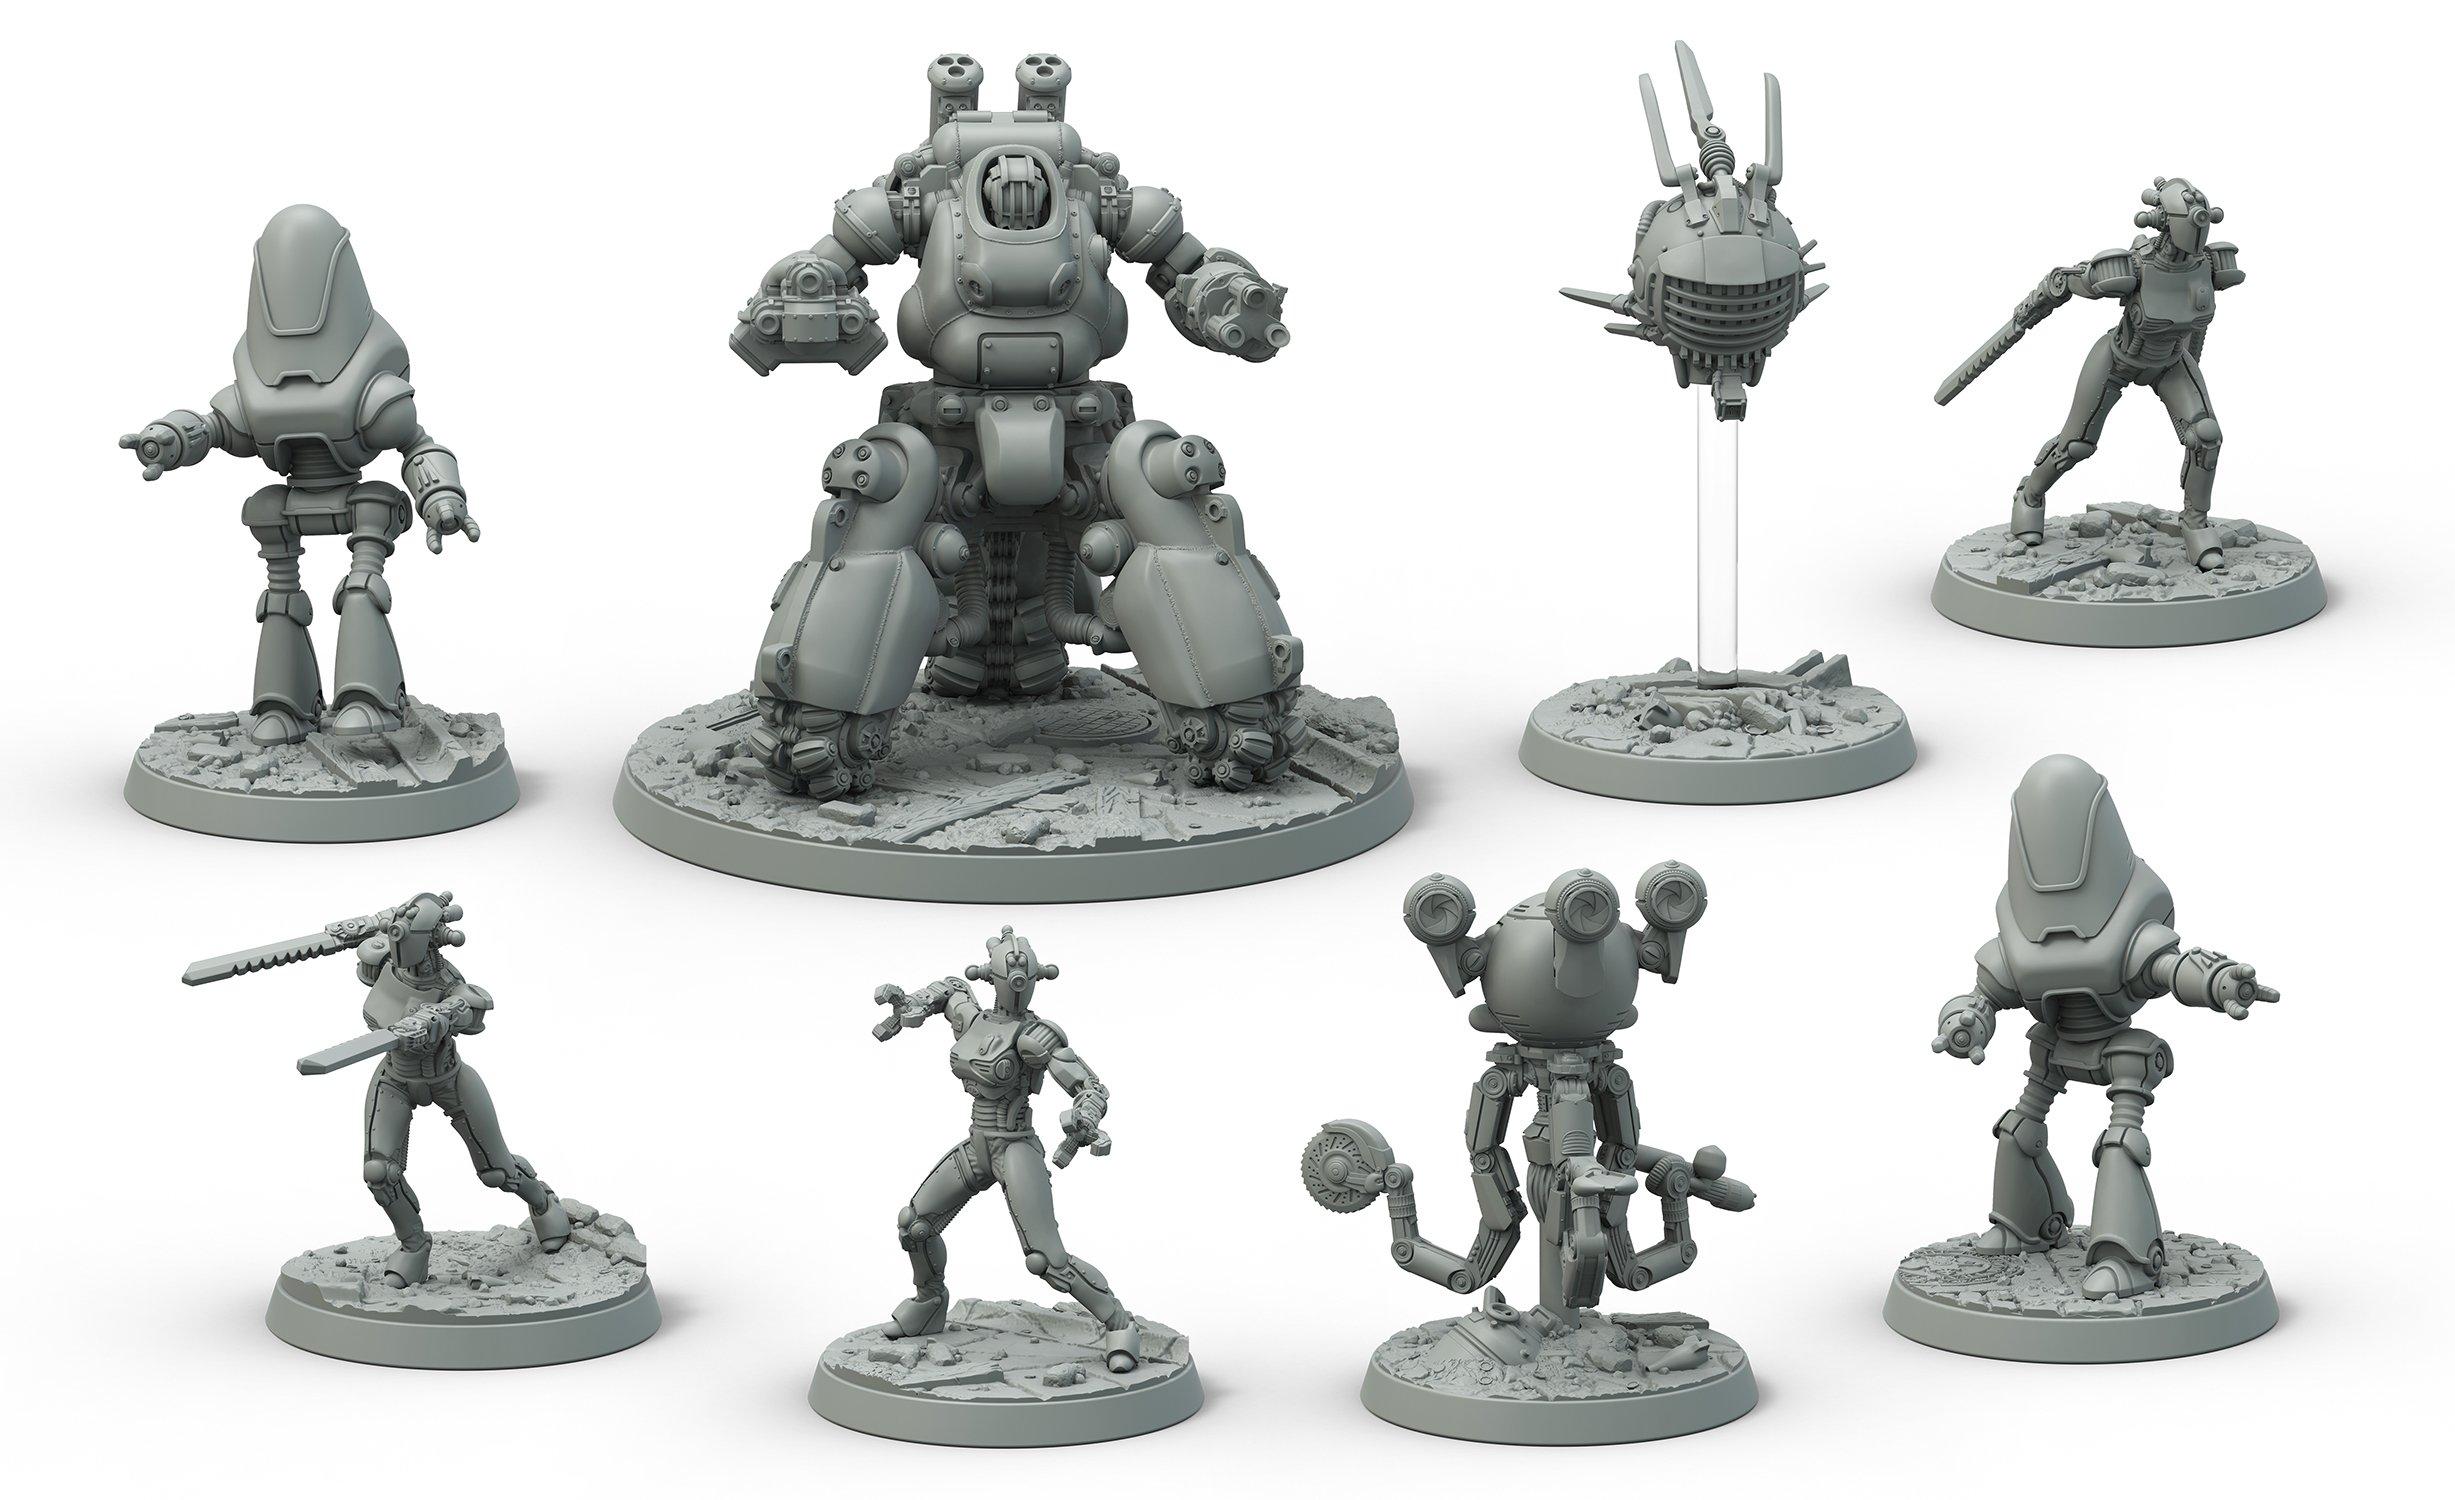 FO Store Wasteland Robot Set 1